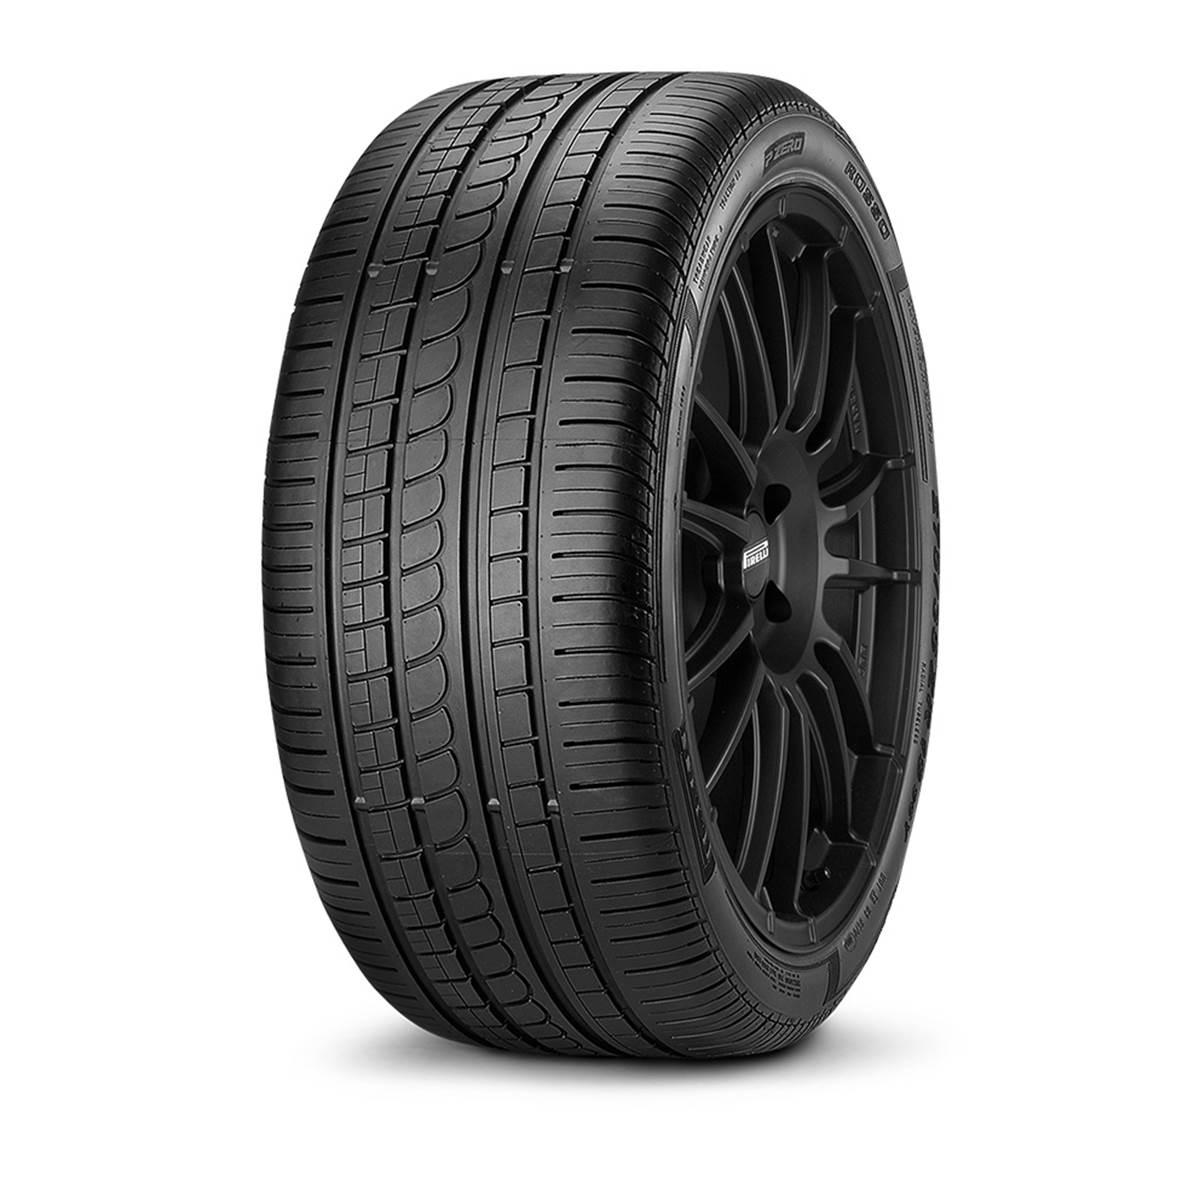 Pneu Pirelli 275/30R19 96Y Pzero Nero (Gt) XL